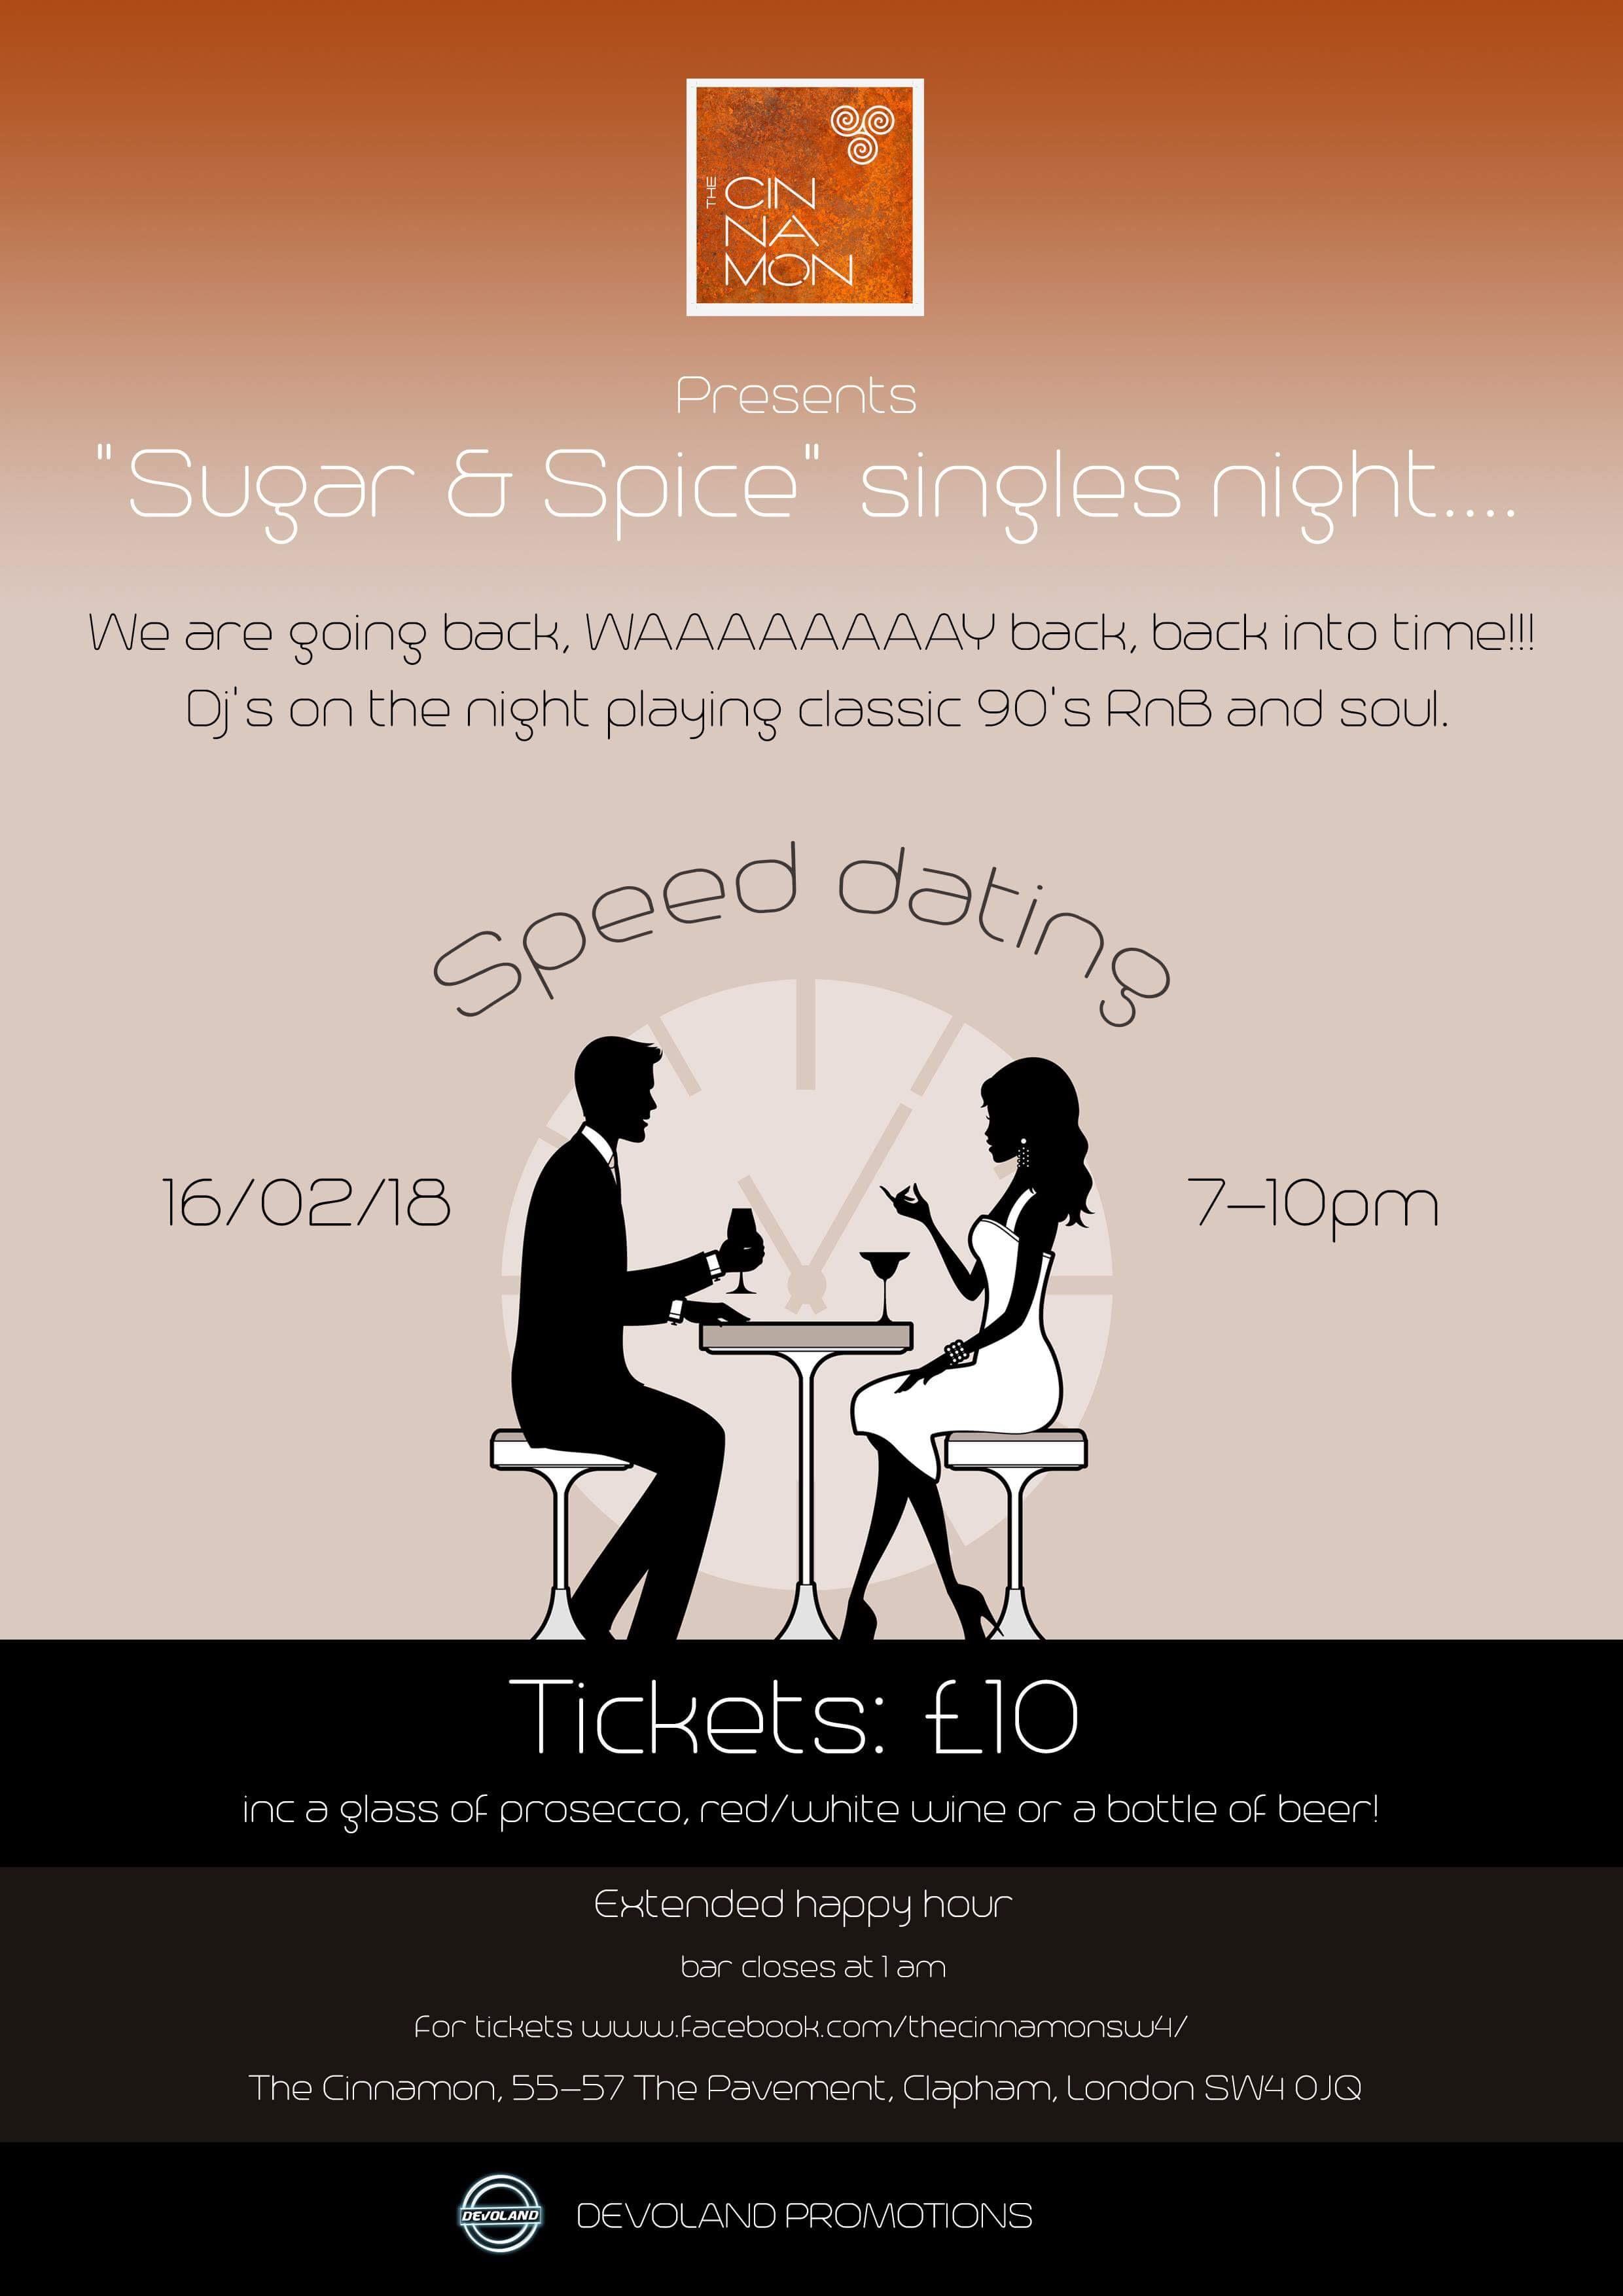 david-boreanaz-sugar-n-spice-speed-dating-skirt-dildo-rapidshare